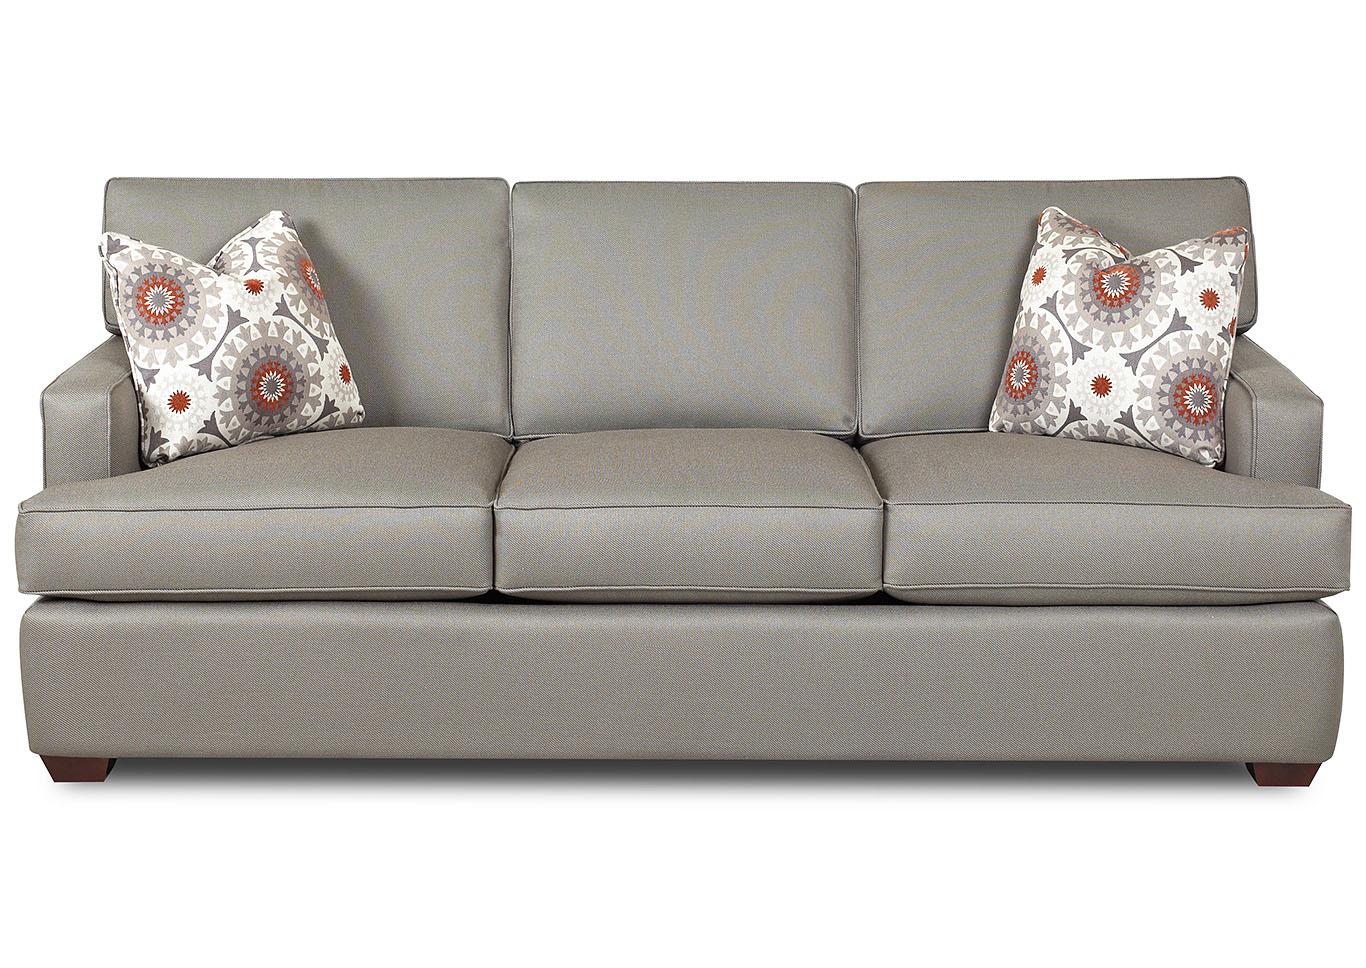 Loomis smoke gray stationary fabric sofaklaussner home furnishings